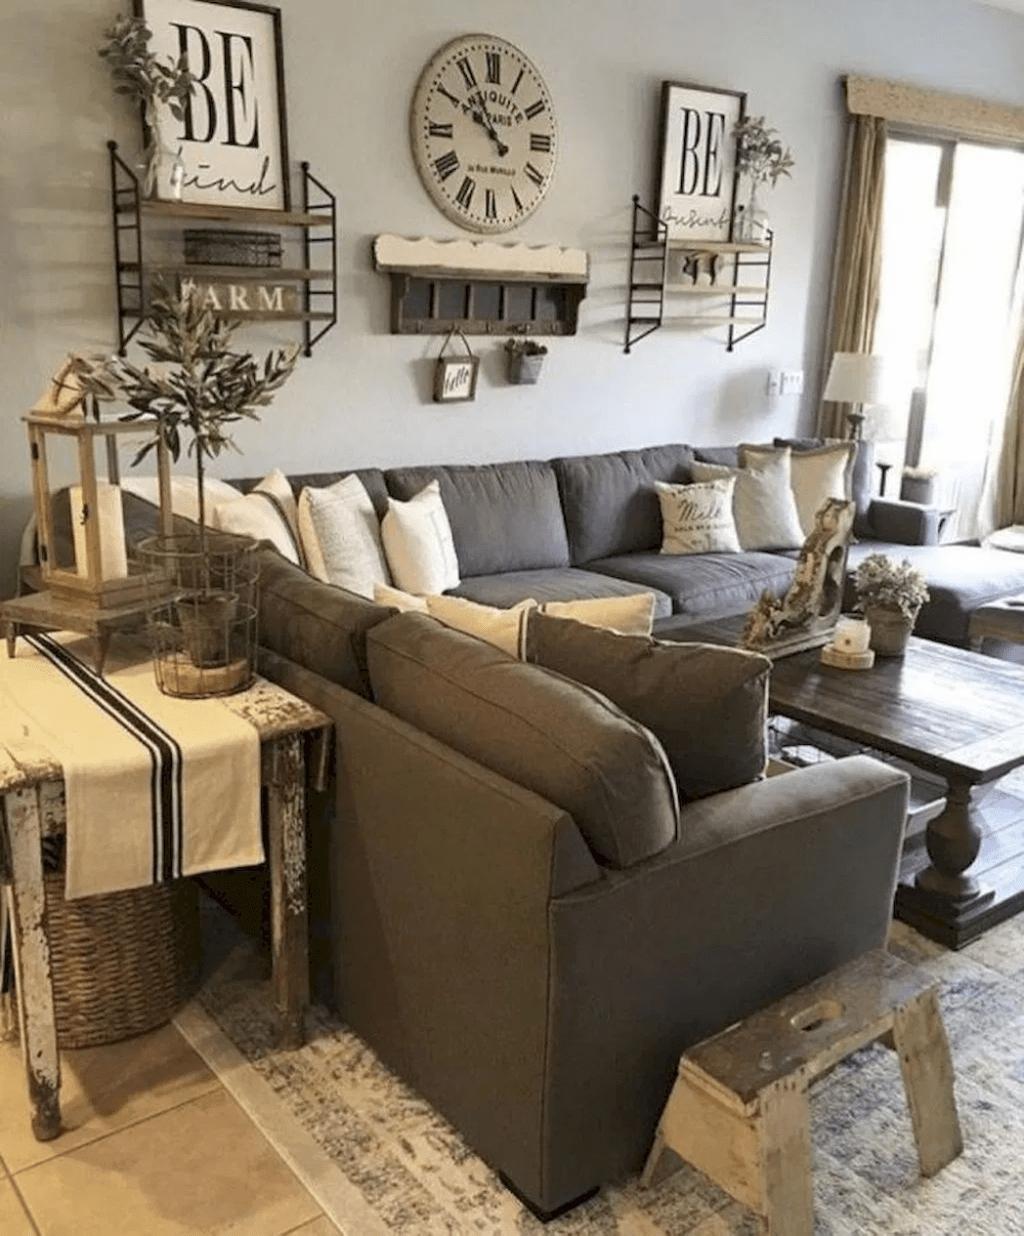 4 Nice Rustic Farmhouse Living Room Design And Decor Ideas in